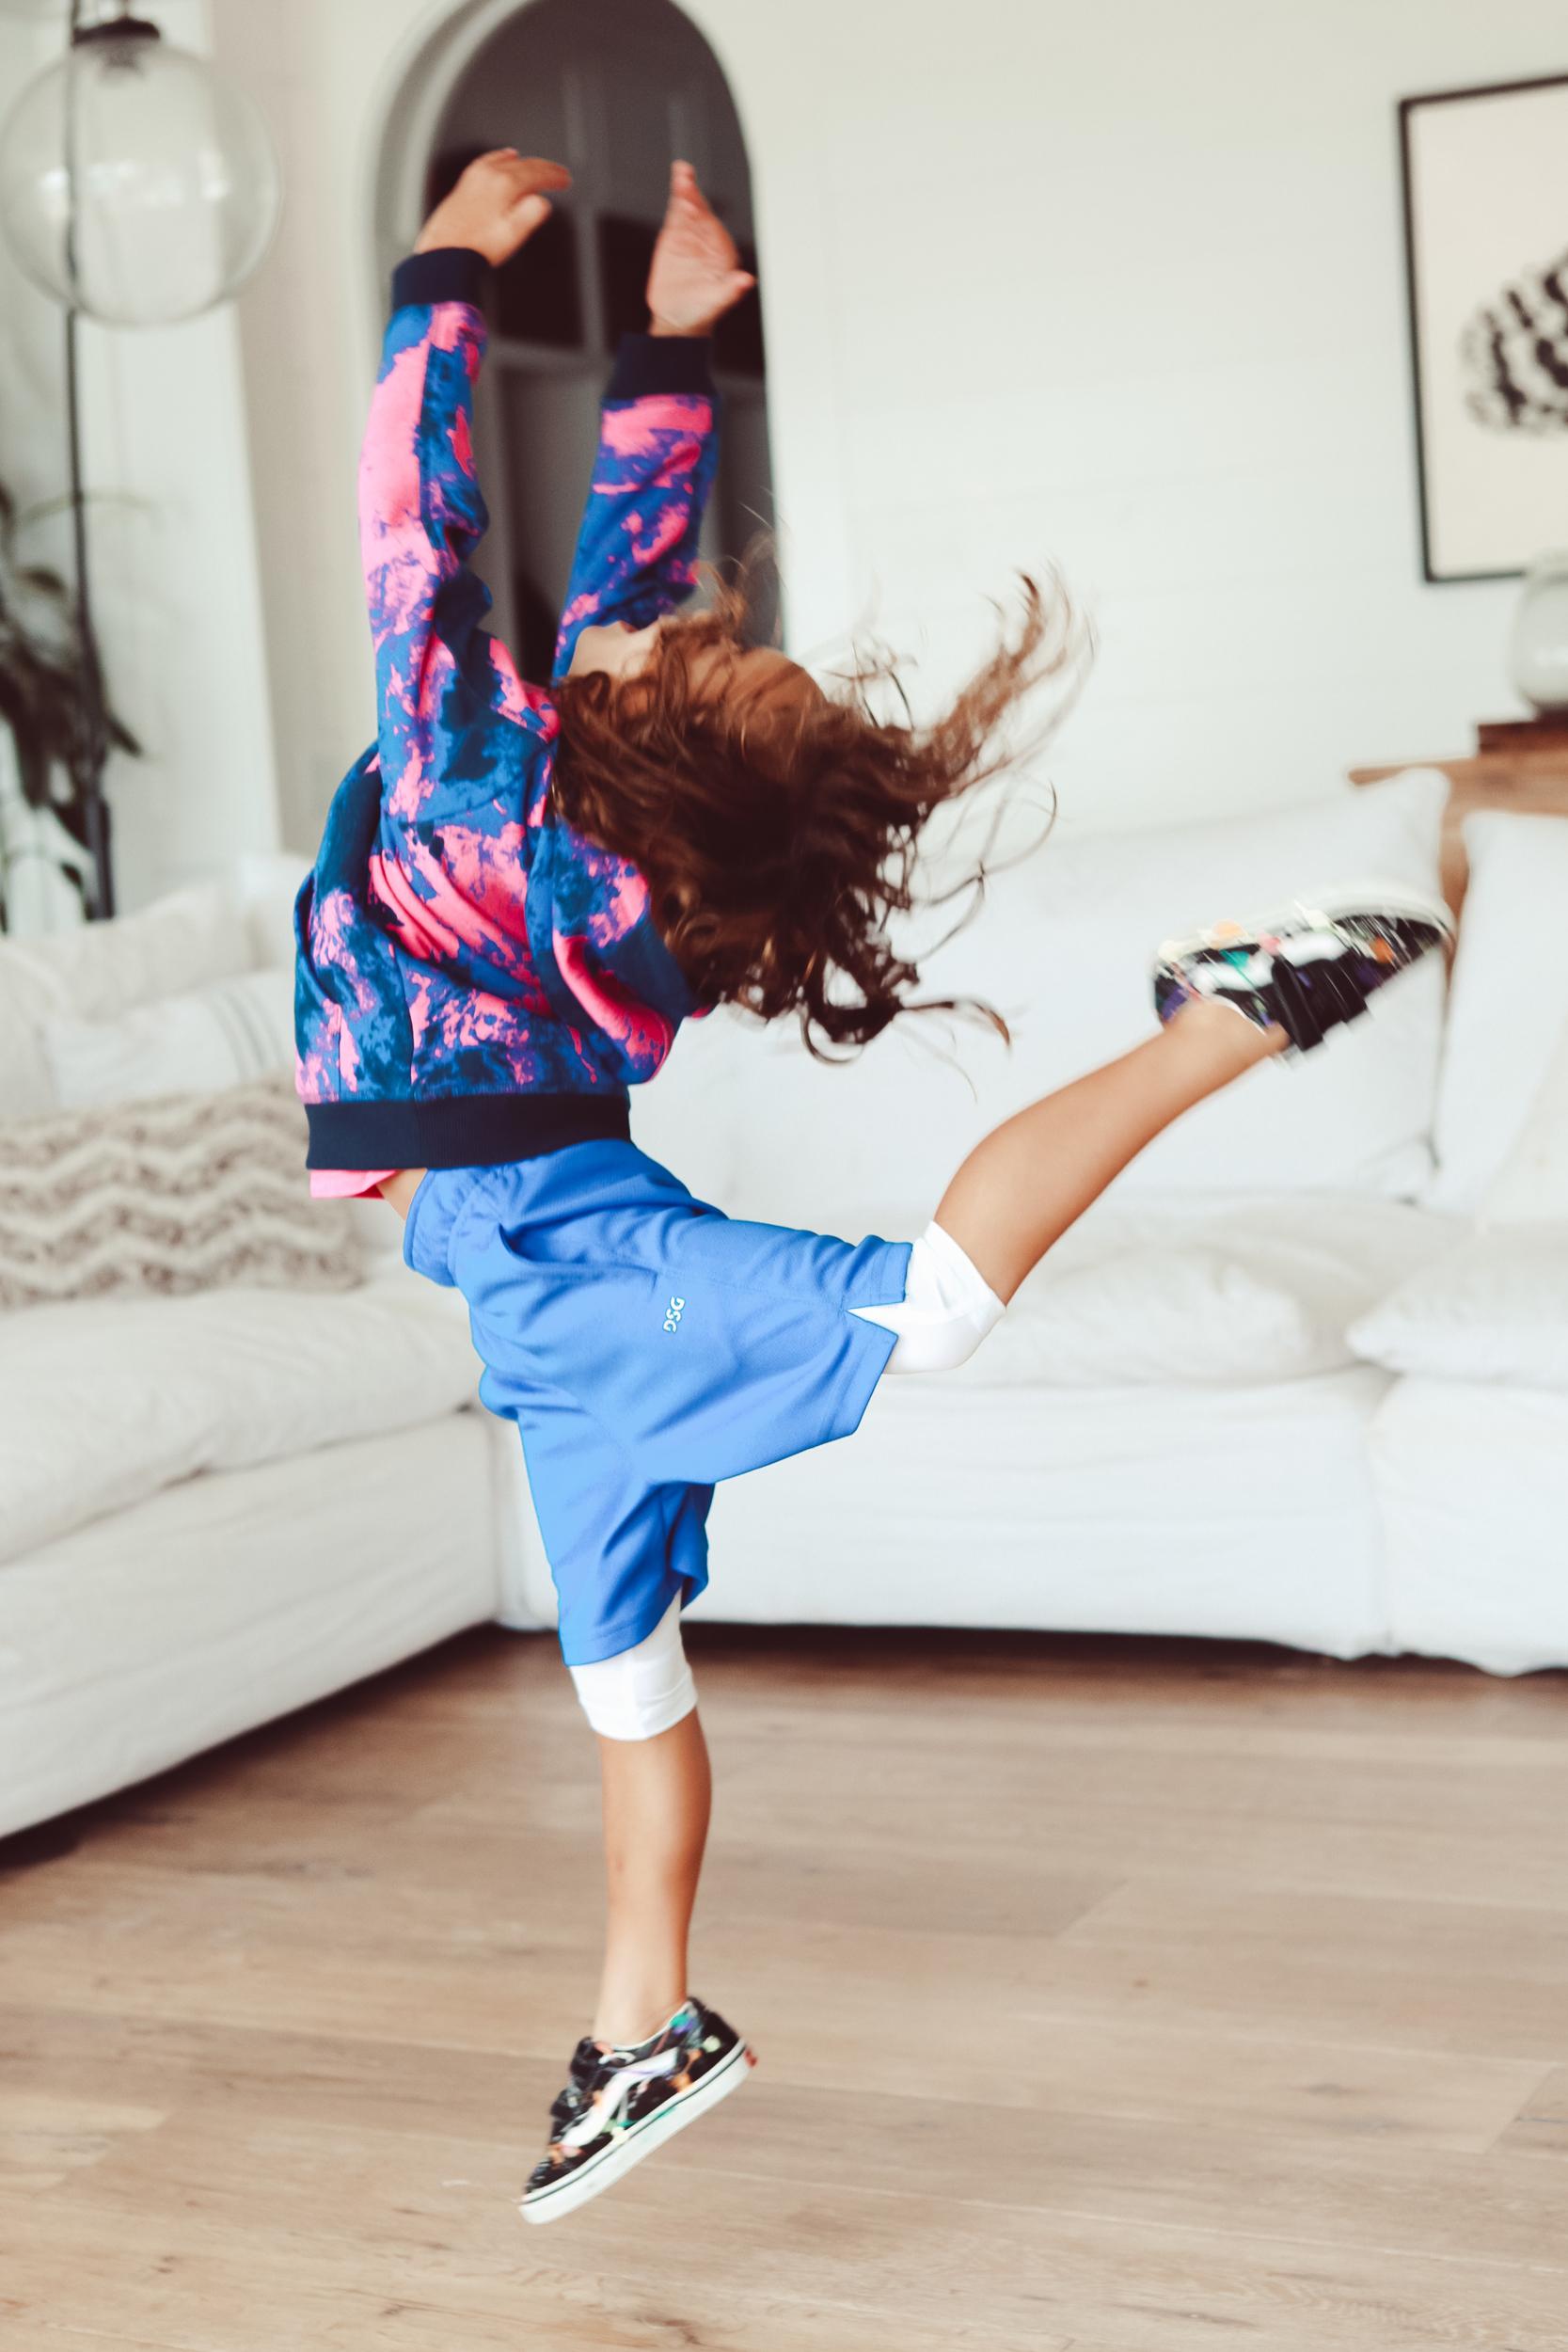 kid dancing in living room